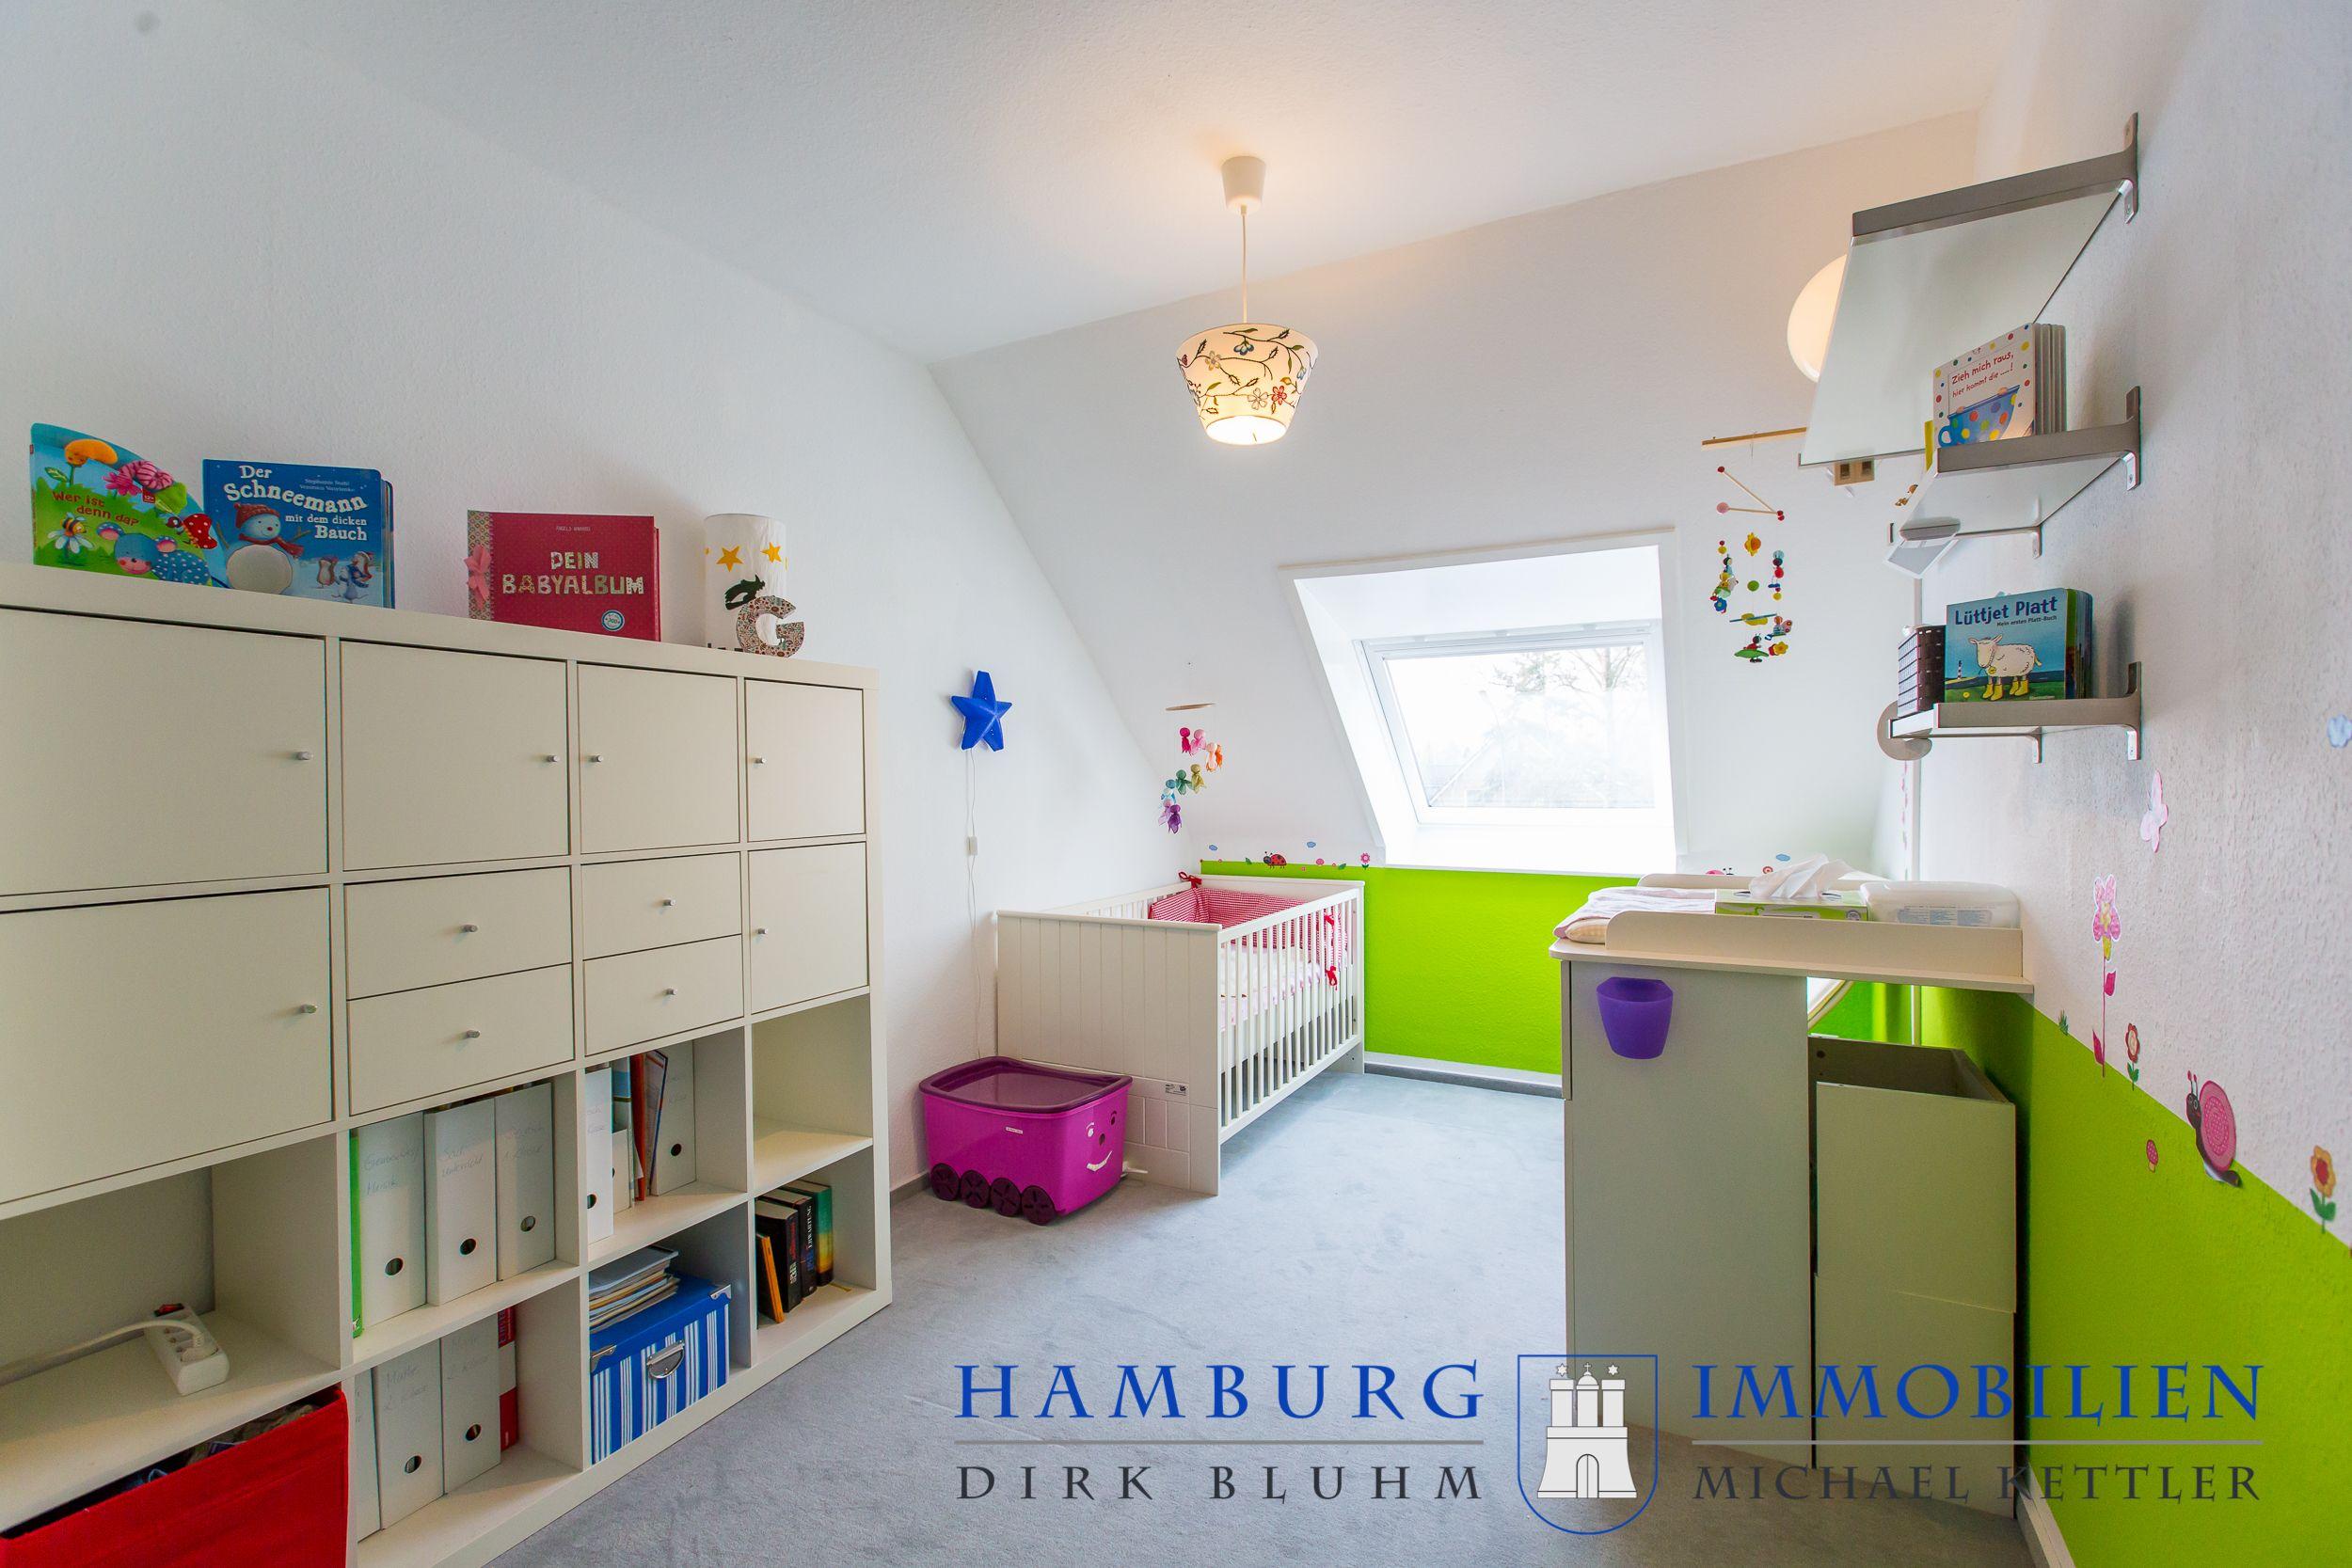 Full Size of Pin On Kinderzimmer Ideen Regal Weiß Sofa Regale Kinderzimmer Teppichboden Kinderzimmer